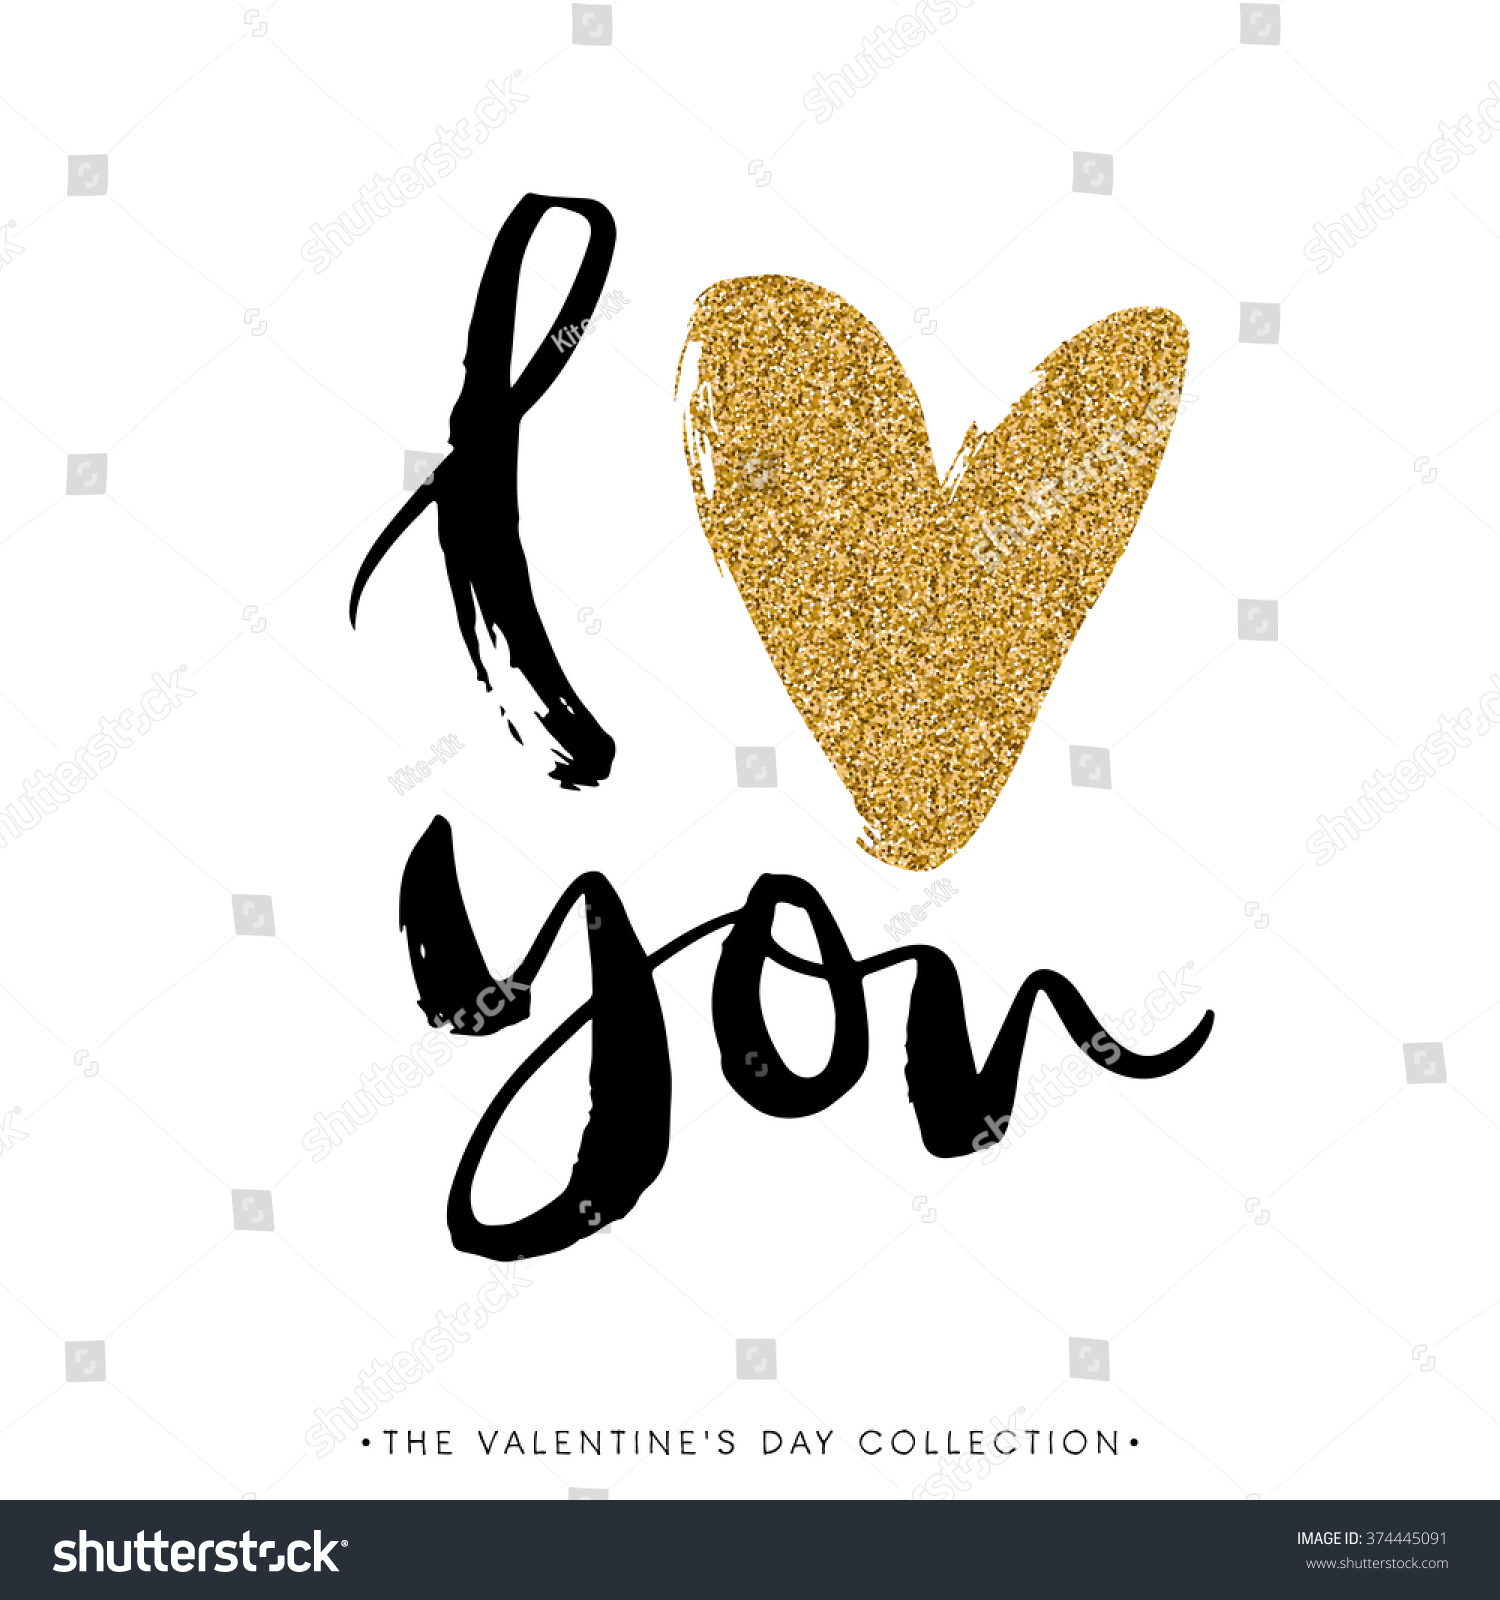 Love You Heart You Valentines Day Stock-Vektorgrafik 374445091 ...